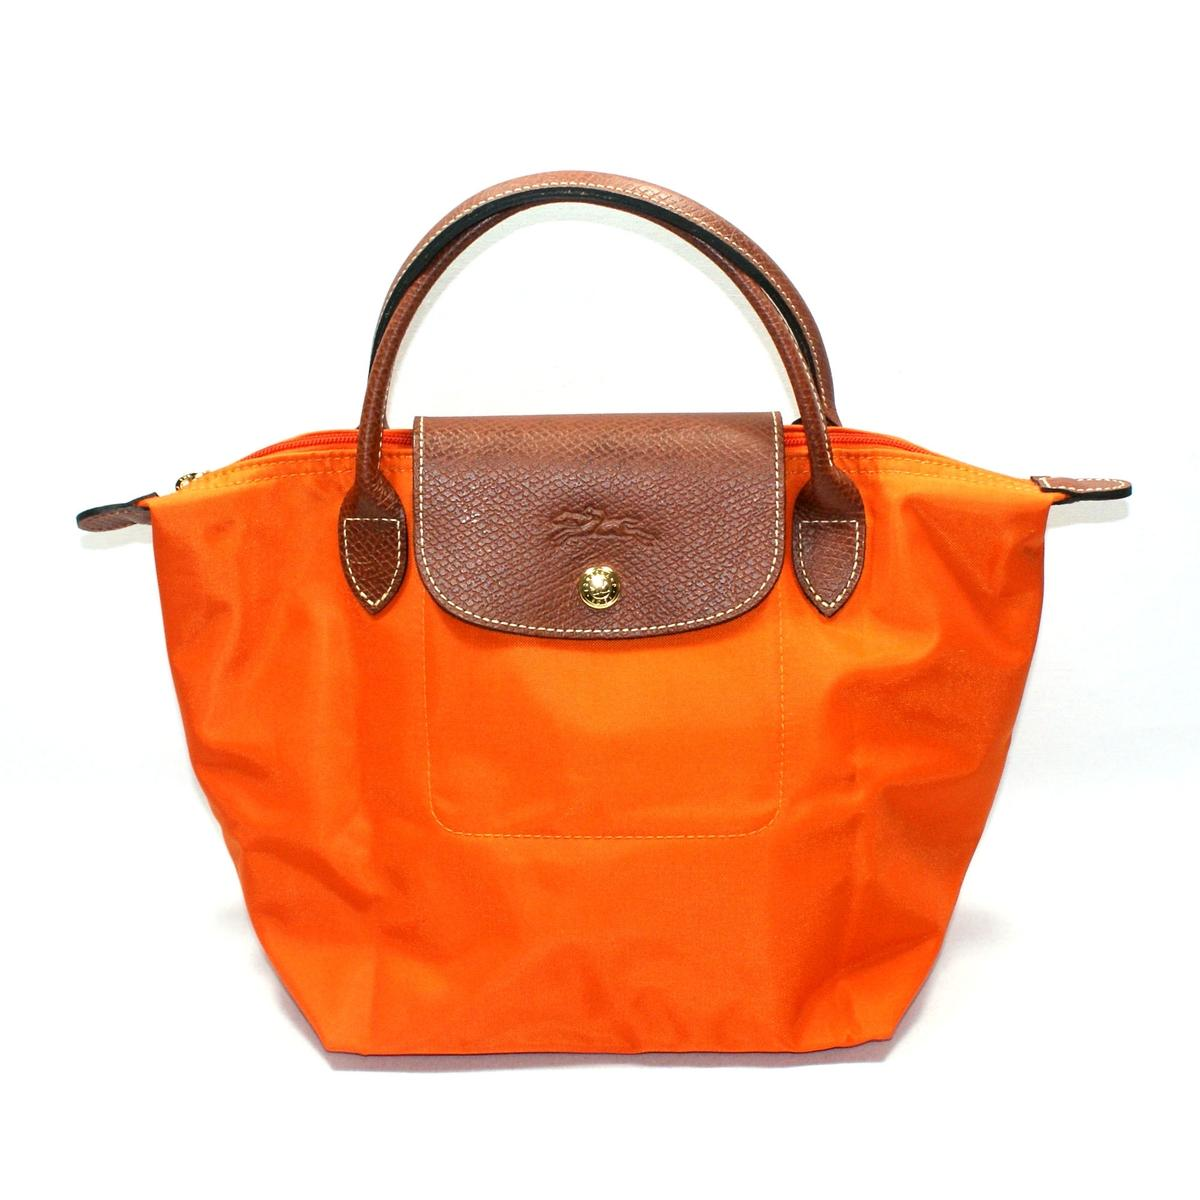 ... Place Mini Duffle Tote Bag Orange #1621089217 | Longchamp 1621089217